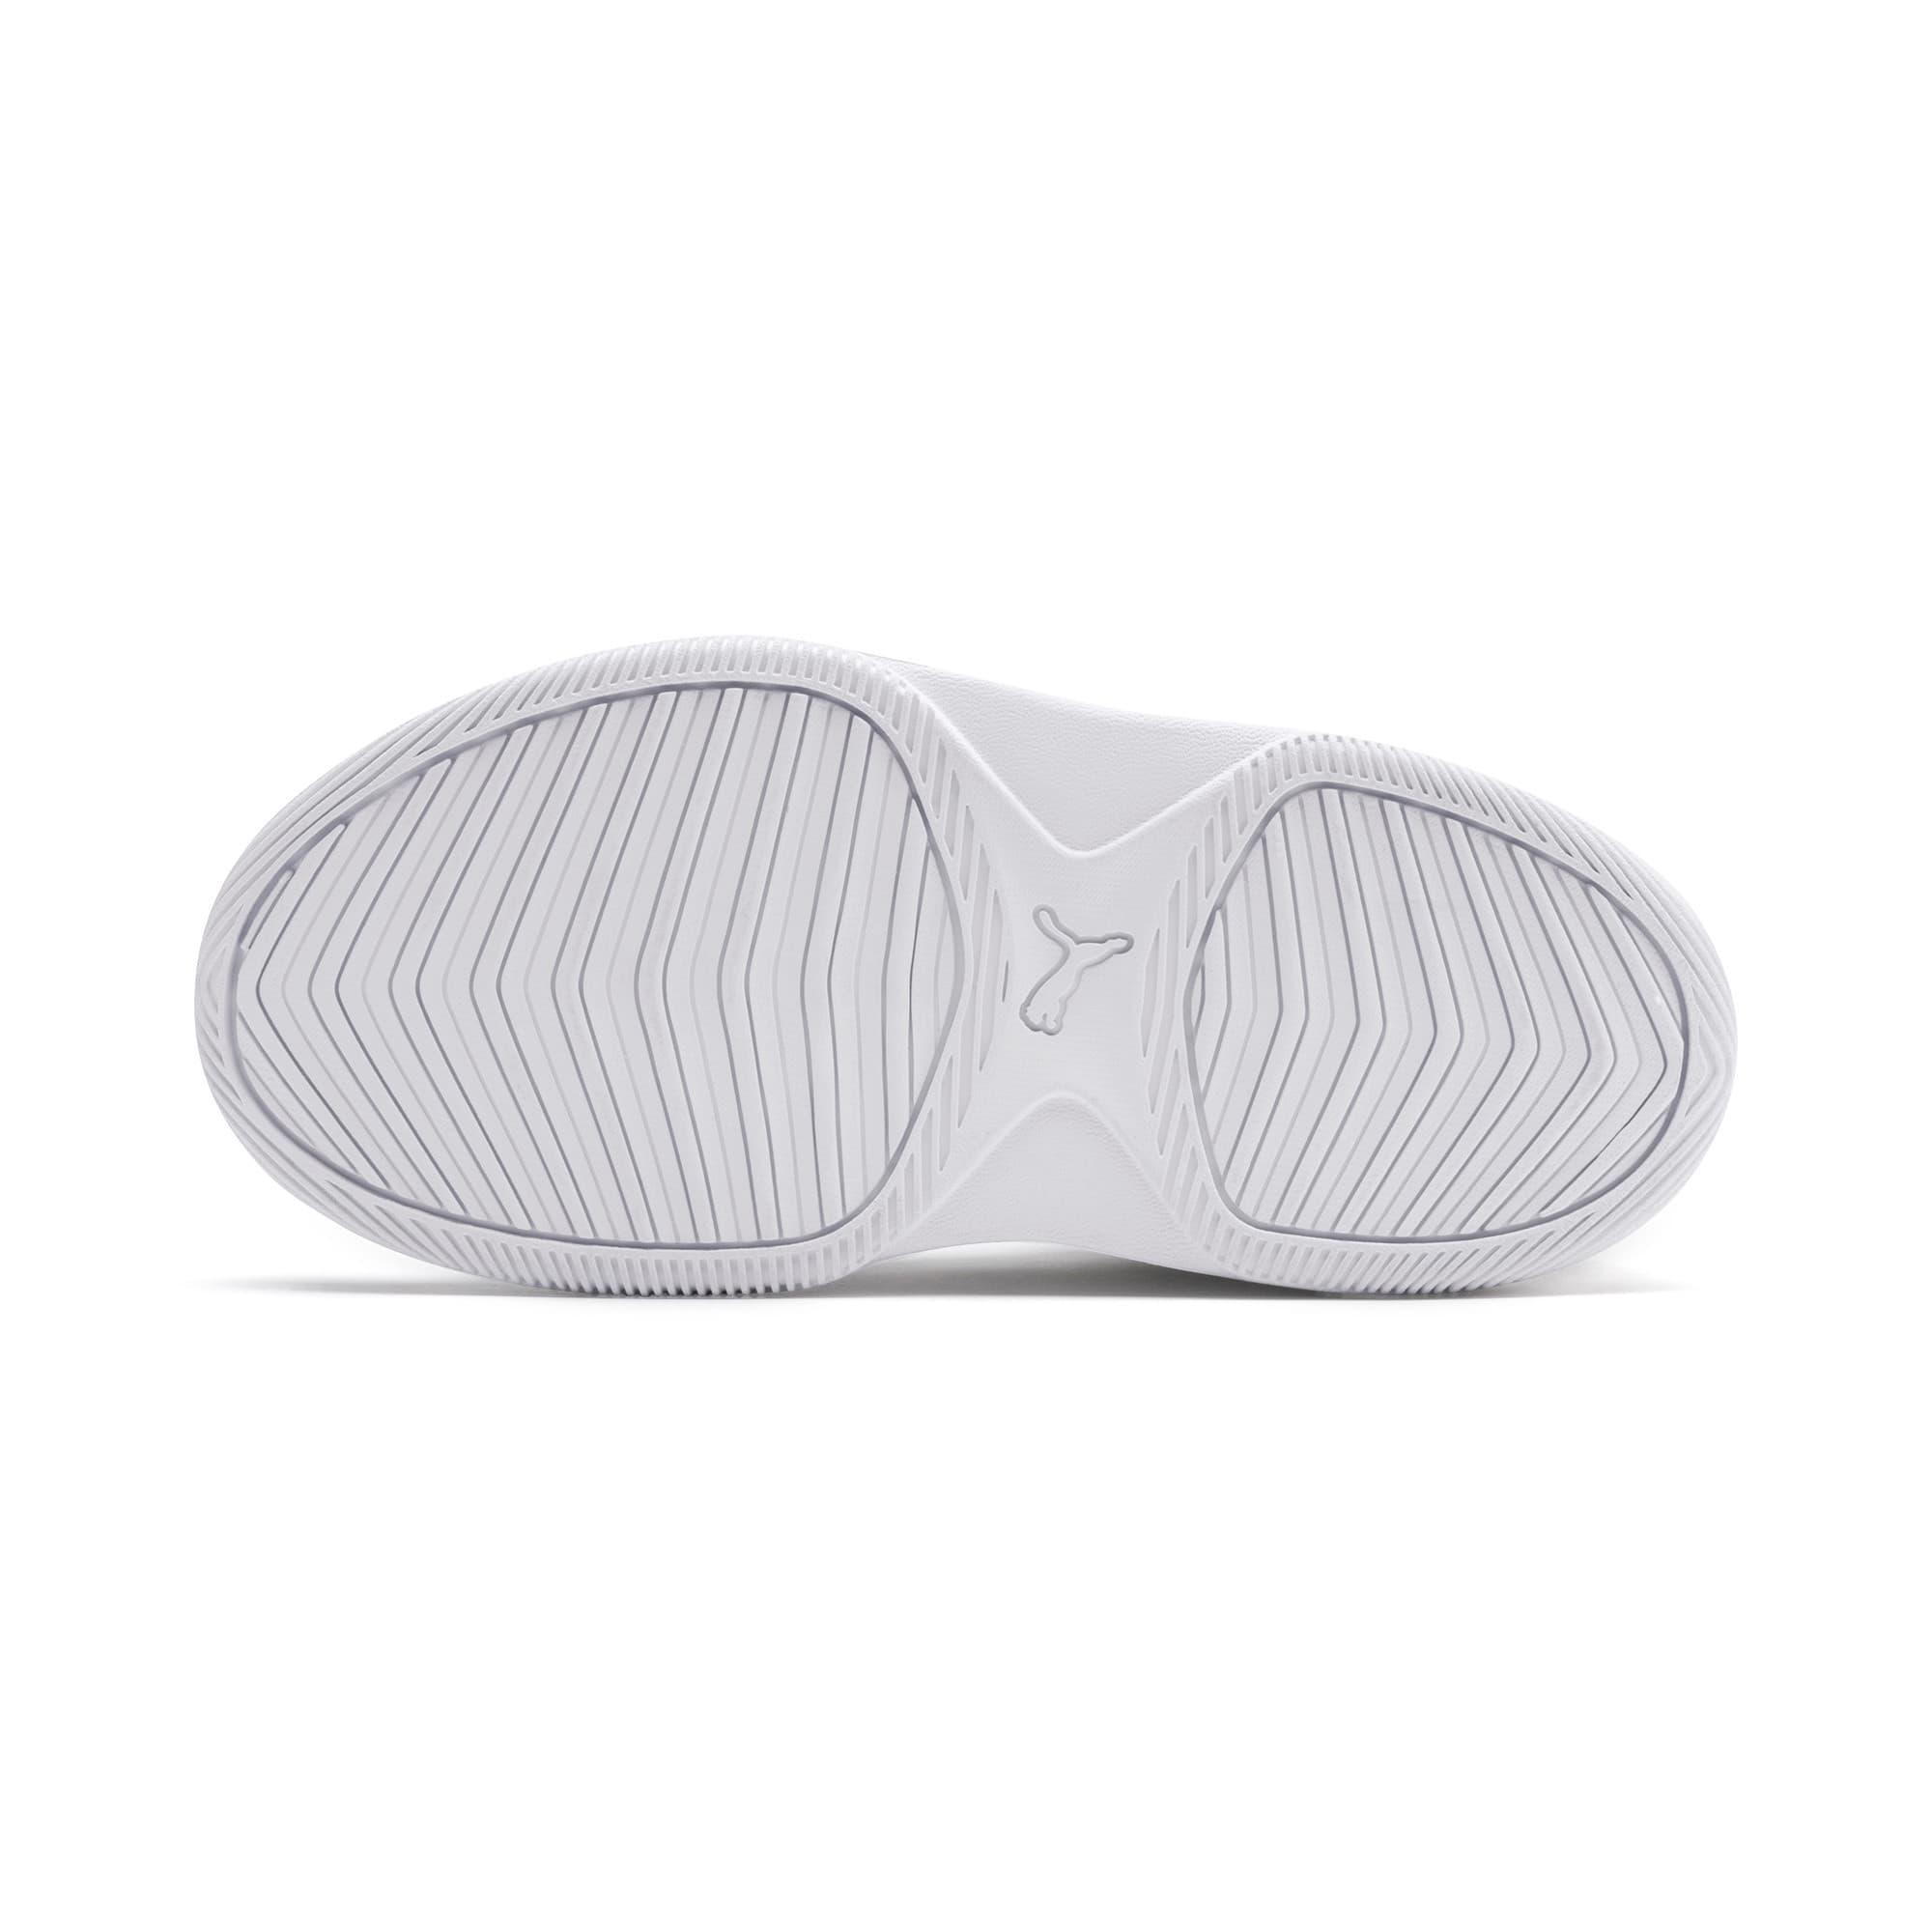 Thumbnail 4 of PUMA Rebound Playoff SL Little Kids' Shoes, Puma White-Puma Silver, medium